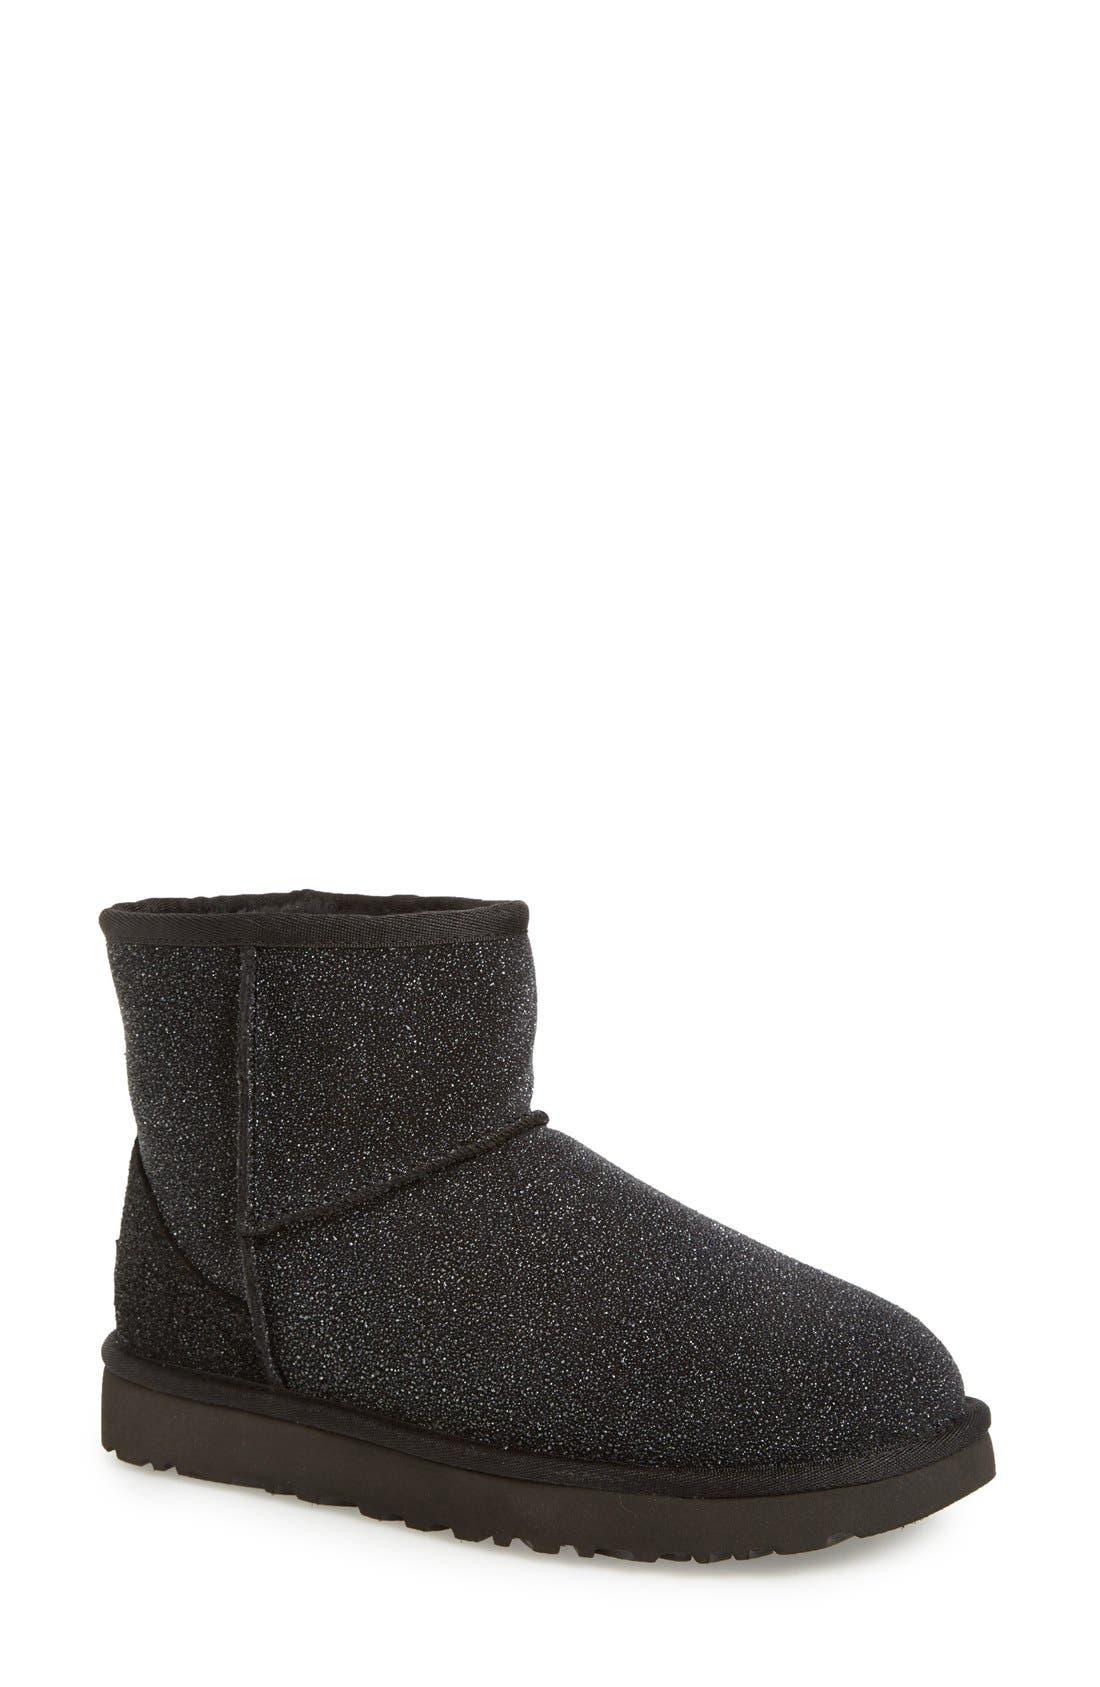 UGG 'Classic Mini Serein' Genuine Shearling Boot,                             Main thumbnail 1, color,                             001